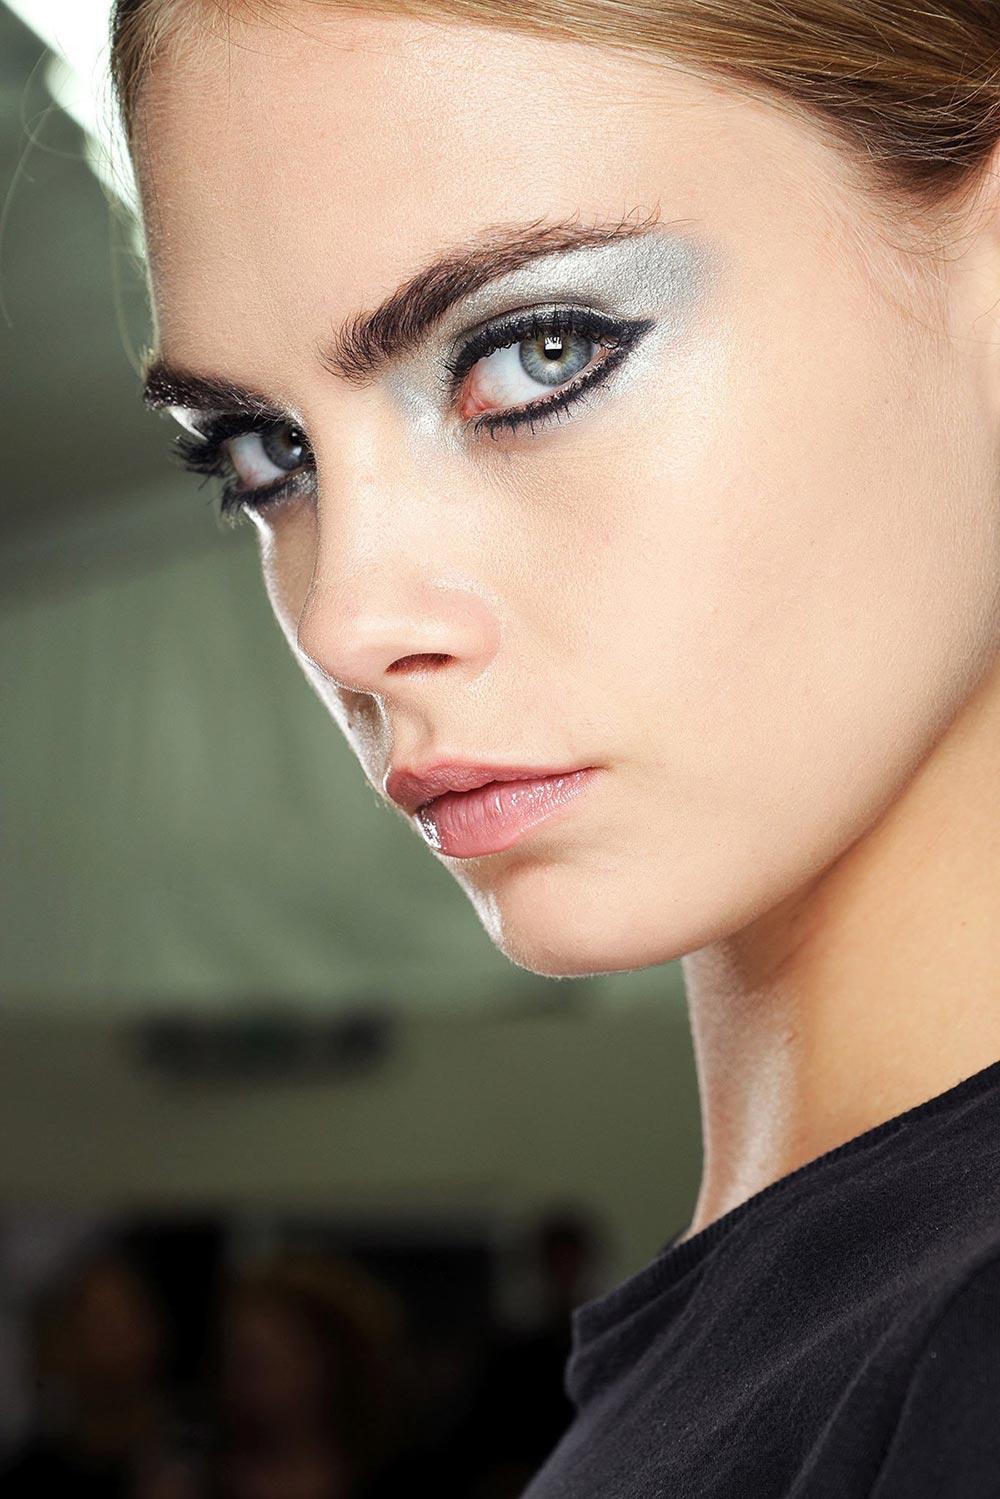 Chanel Spring/Summer 2013 runway beauty look